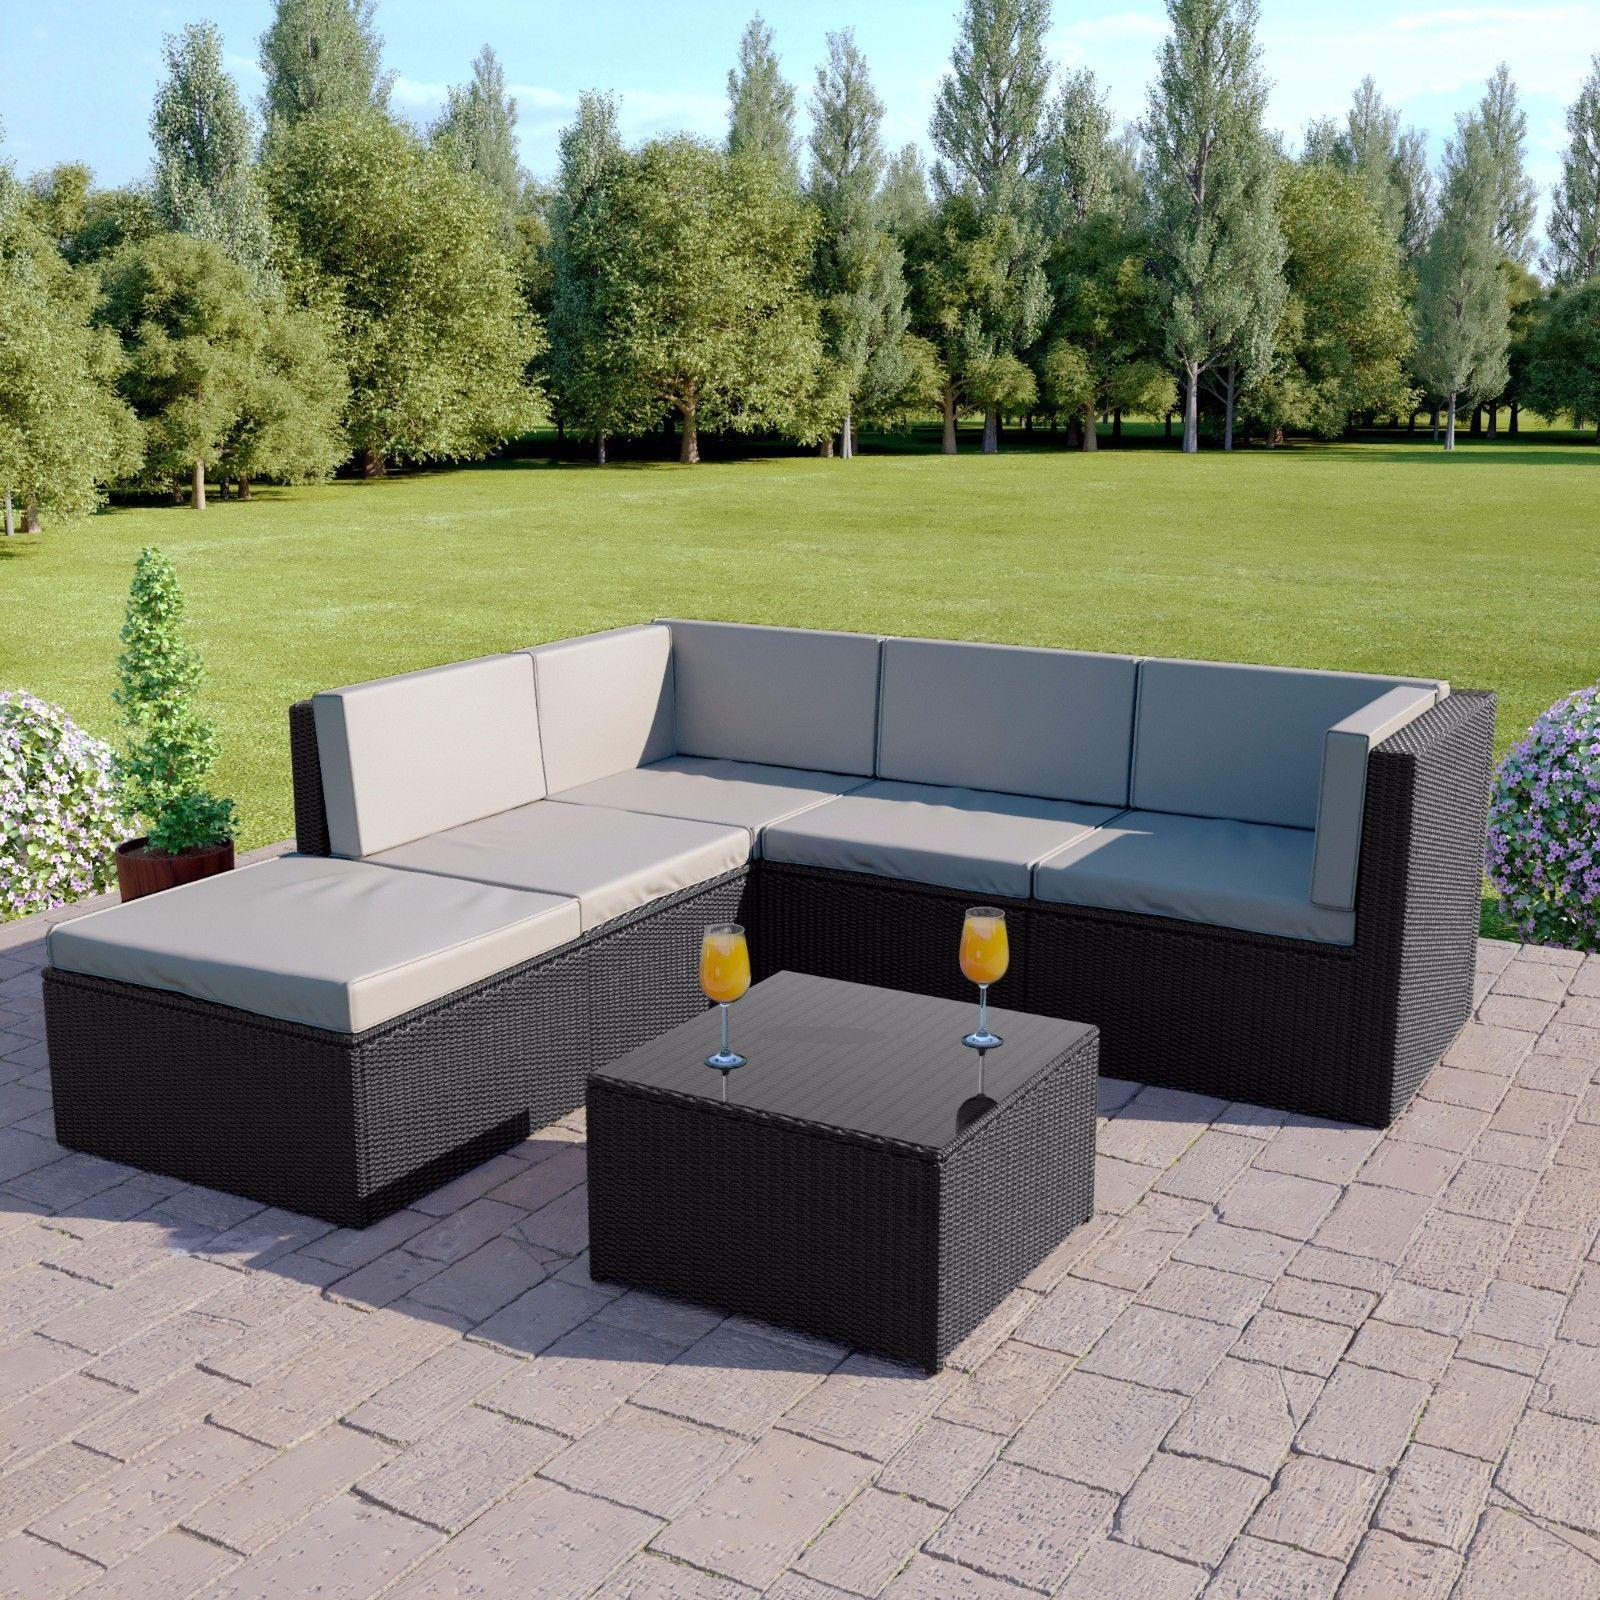 Details About Black Rattan Modular Corner Sofa Set Garden Furniture L Shape Free Cover Corner Sofa With Cushions Rattan Corner Sofa Corner Sofa Set